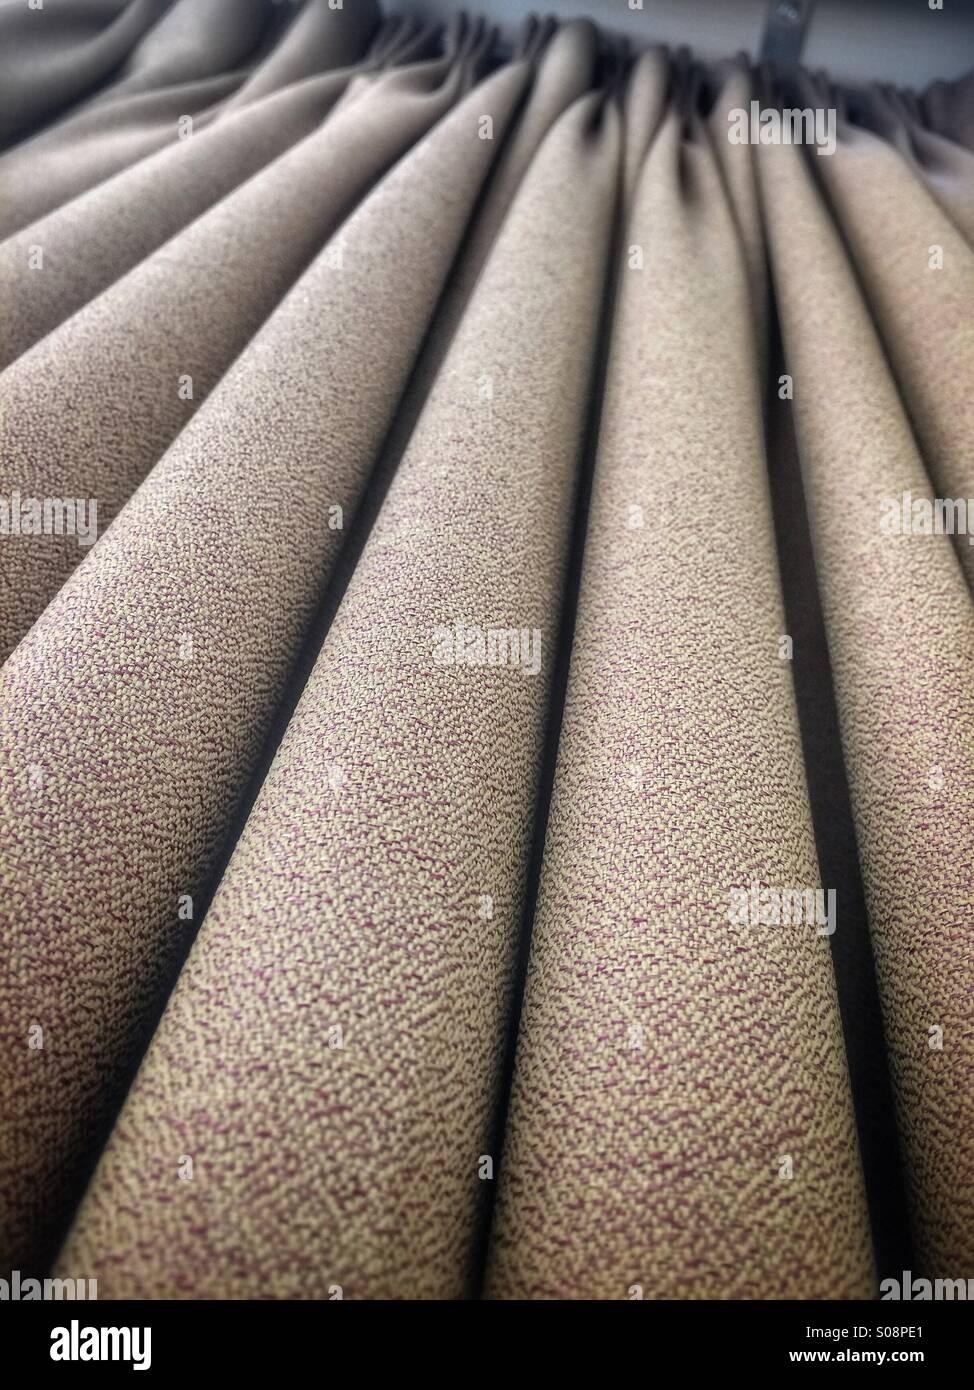 Curtain fabric folds - Stock Image